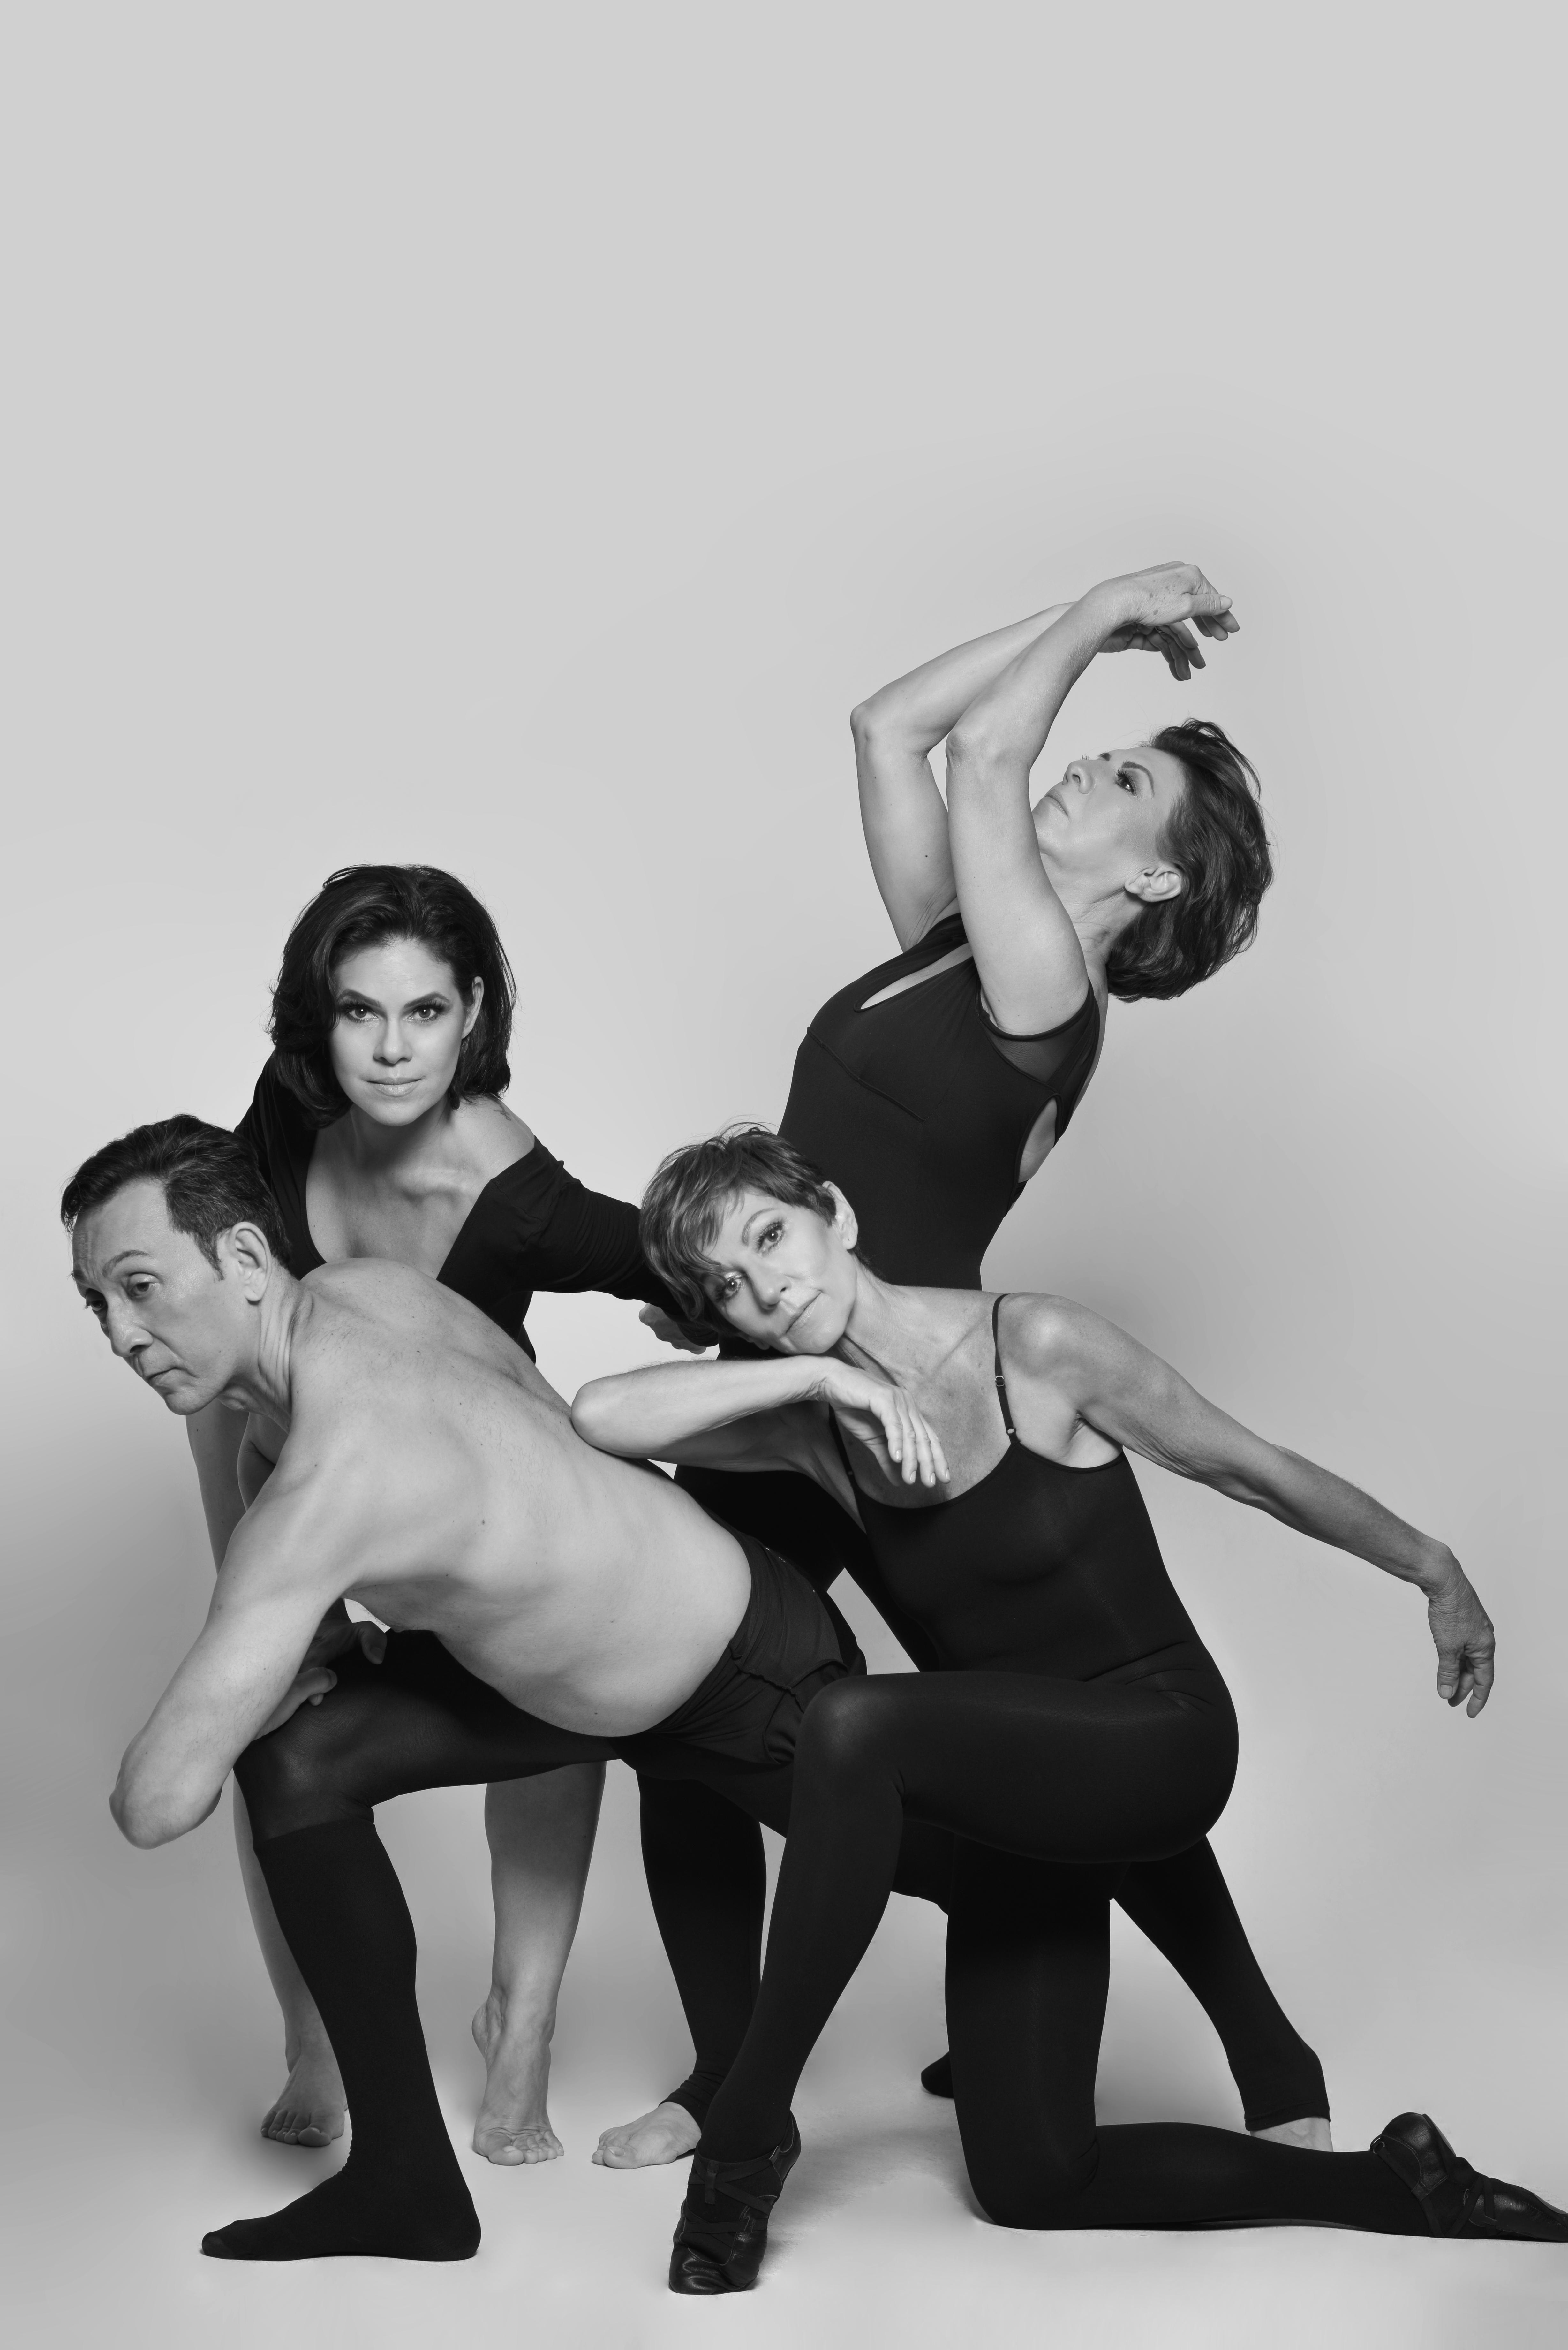 Beatriz, Chico, Neide, Marcia - Ricardo Valêncio